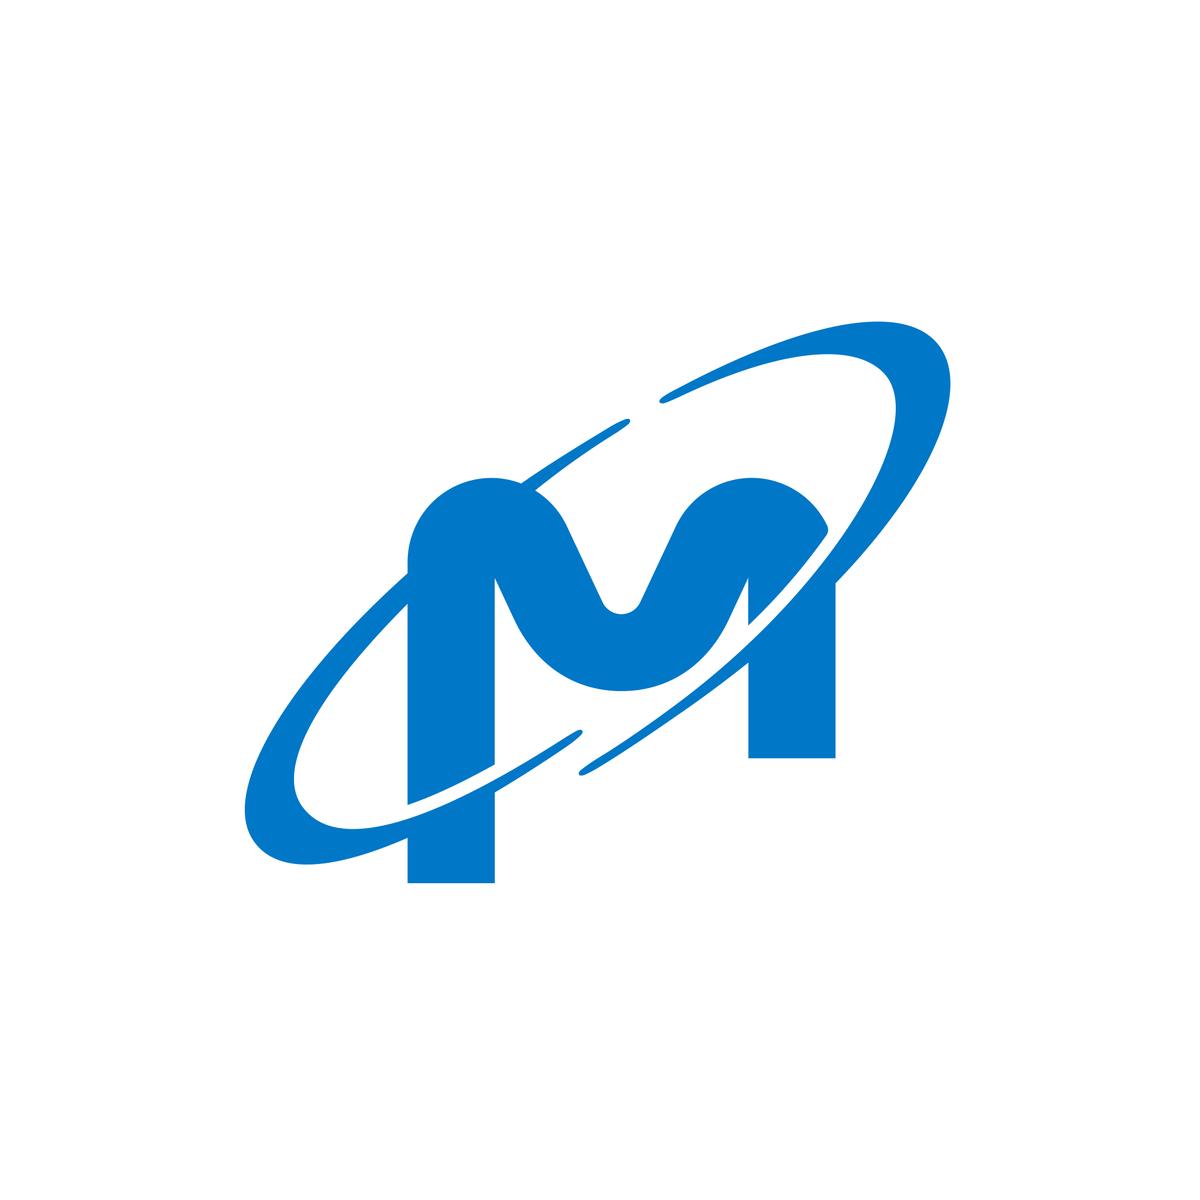 Micron Logo United States Letter M Logo Single Letter Logo Lettering